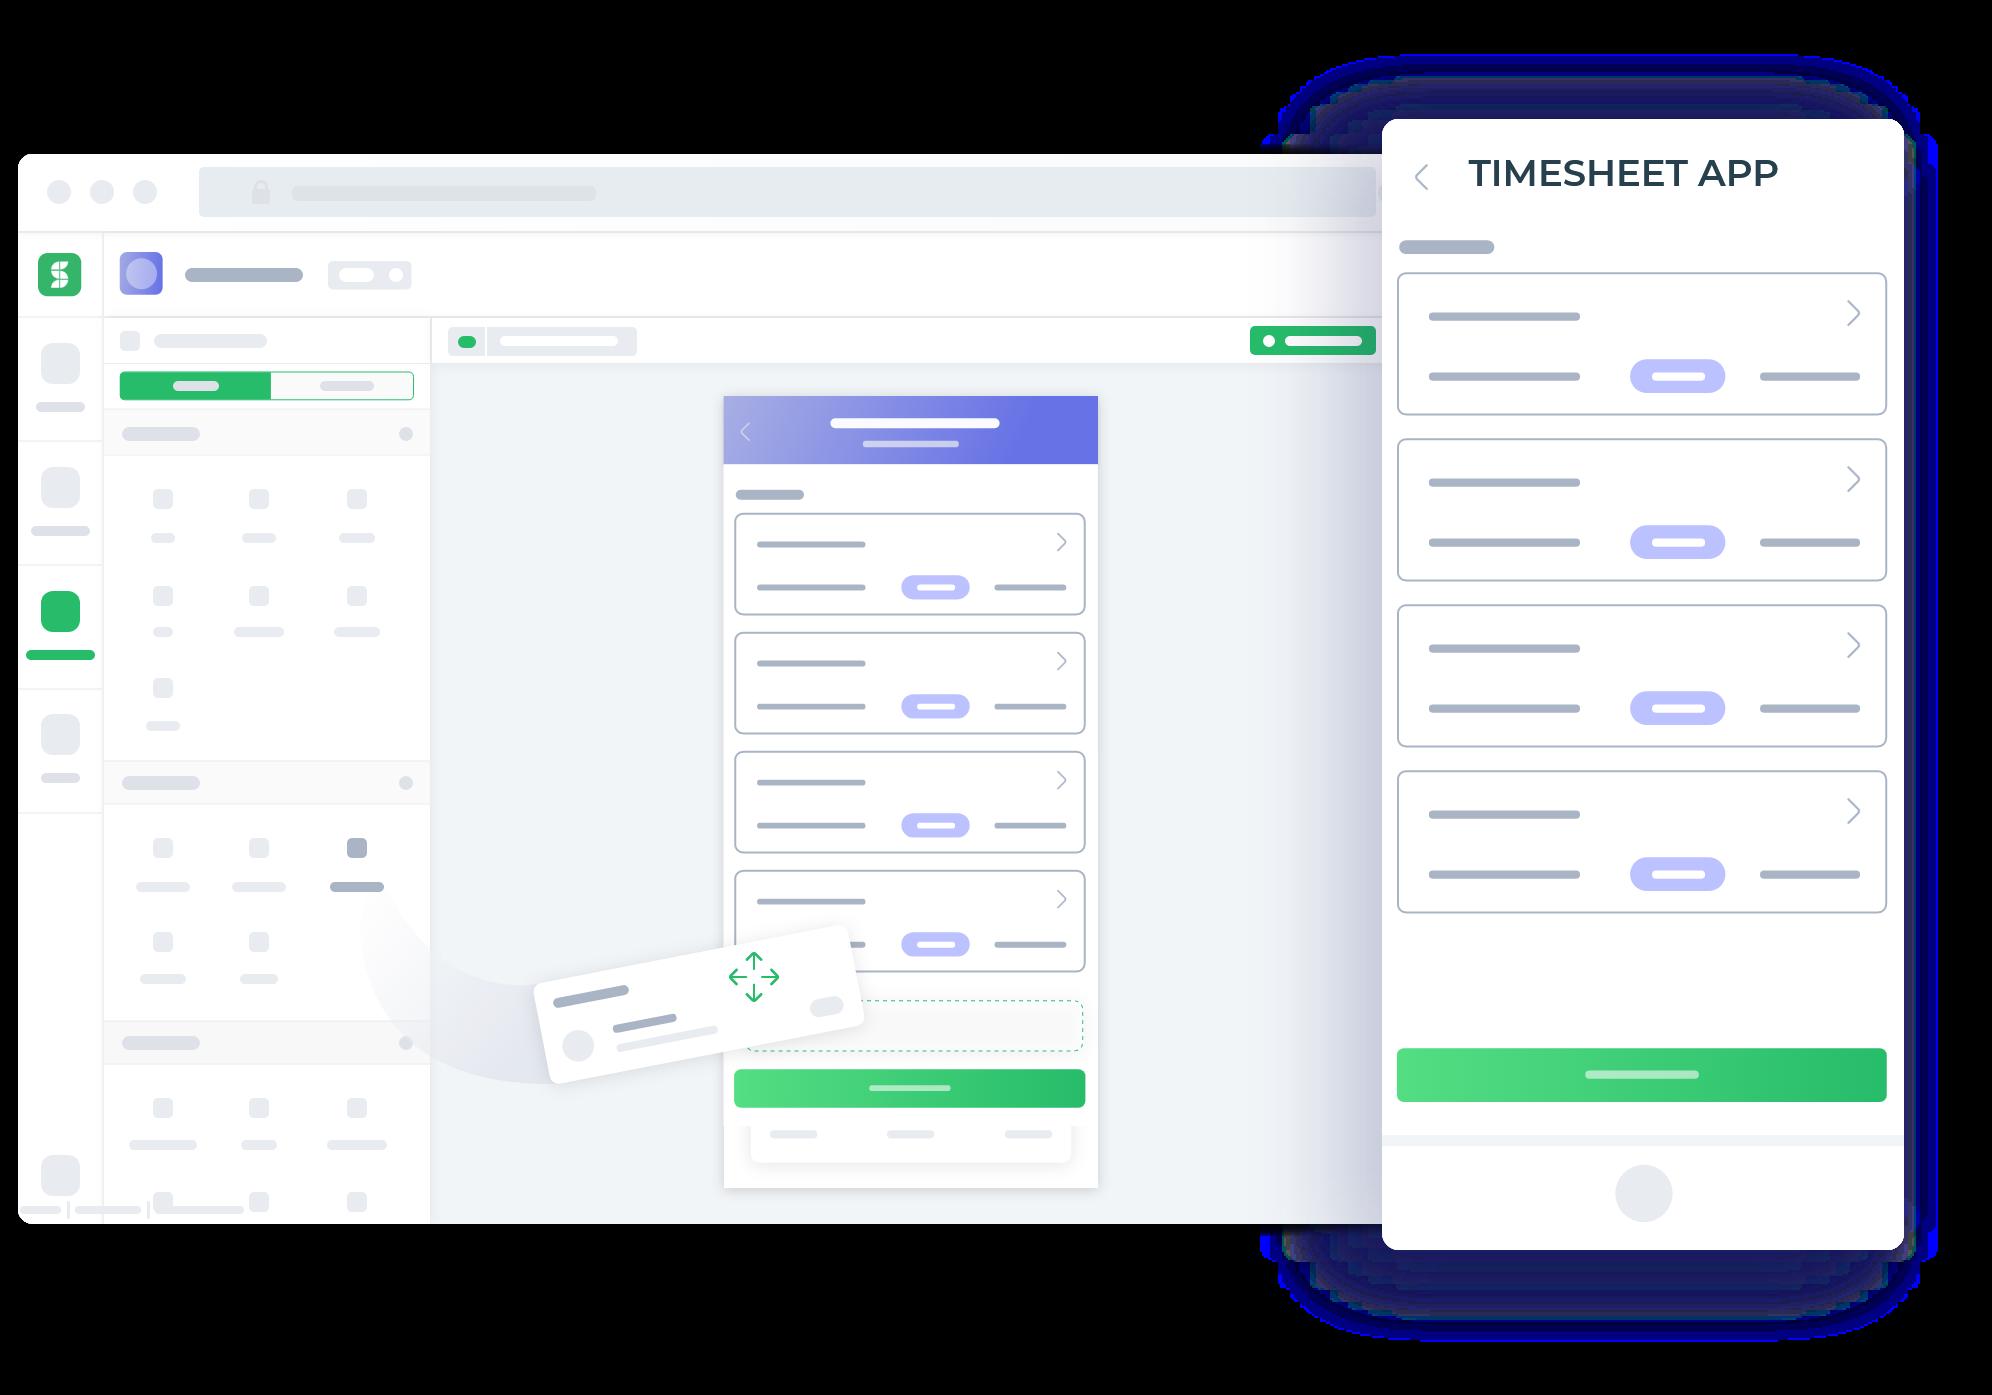 timesheet management apps